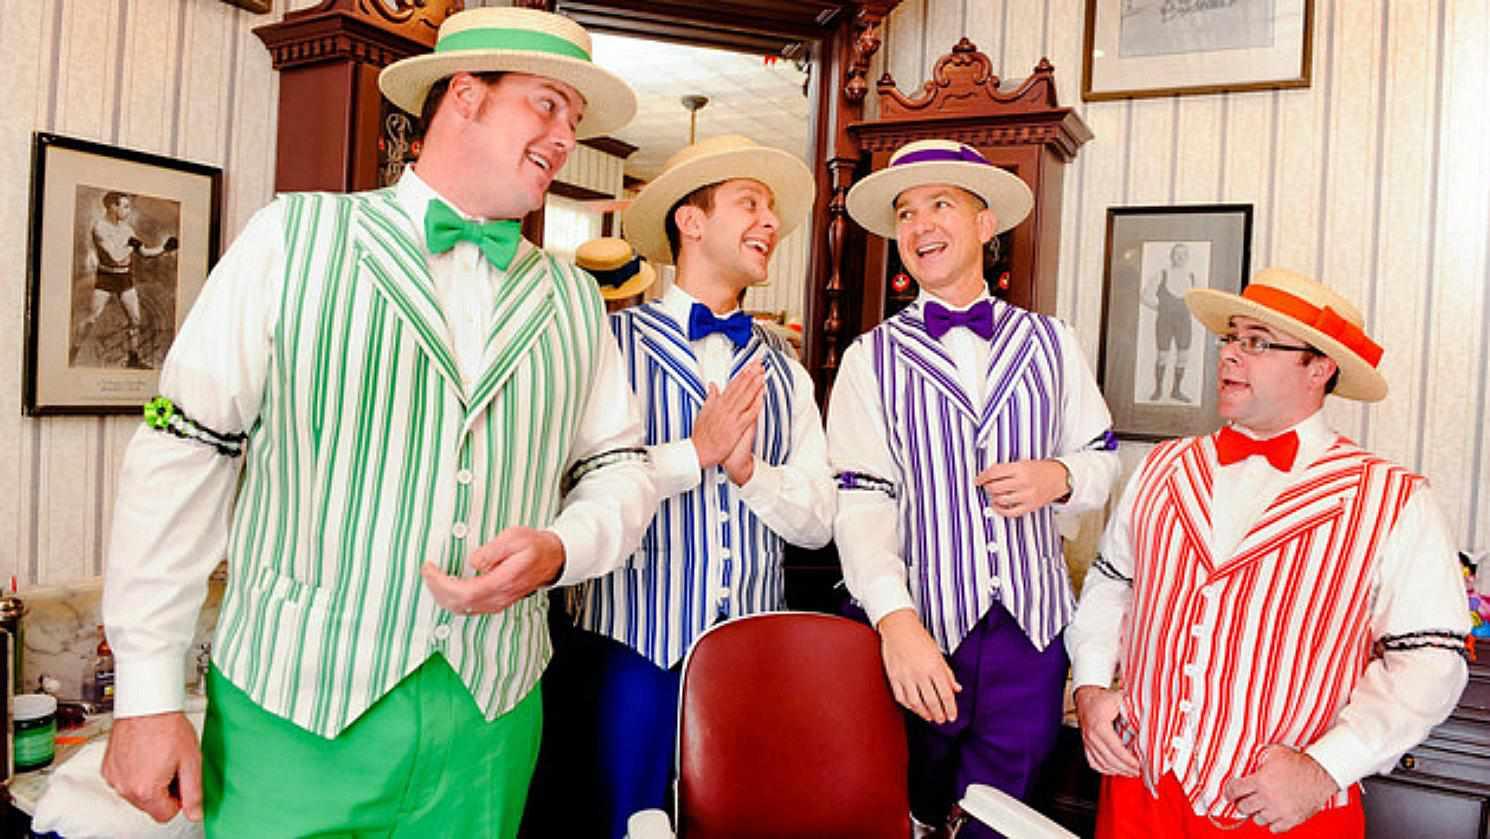 Harmony Barber Shop at Disney World